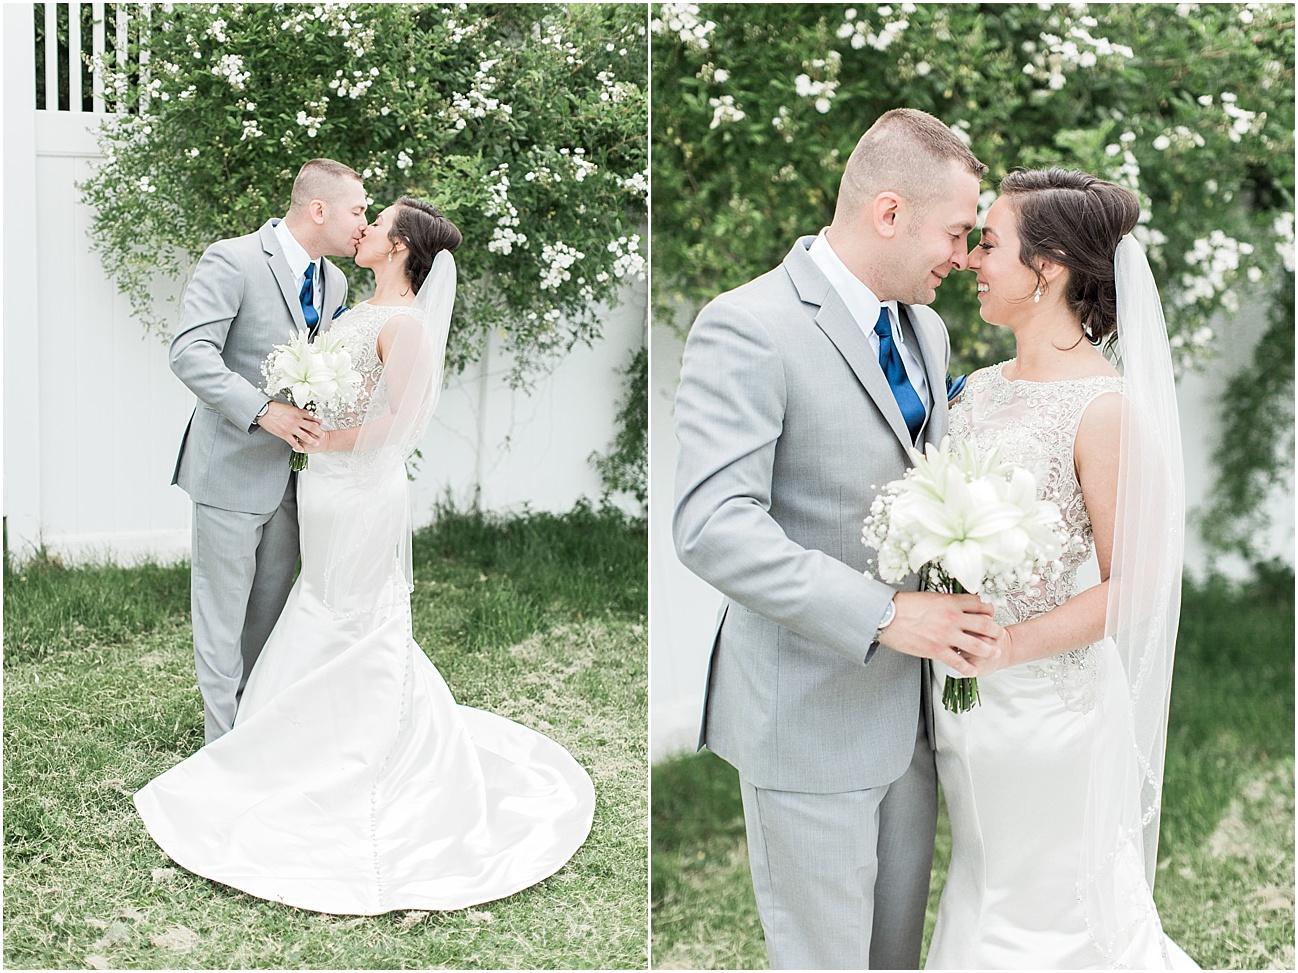 nicole_stephen_cape_club_nicky_falmouth_cod_boston_wedding_photographer_meredith_jane_photography_photo_0179.jpg